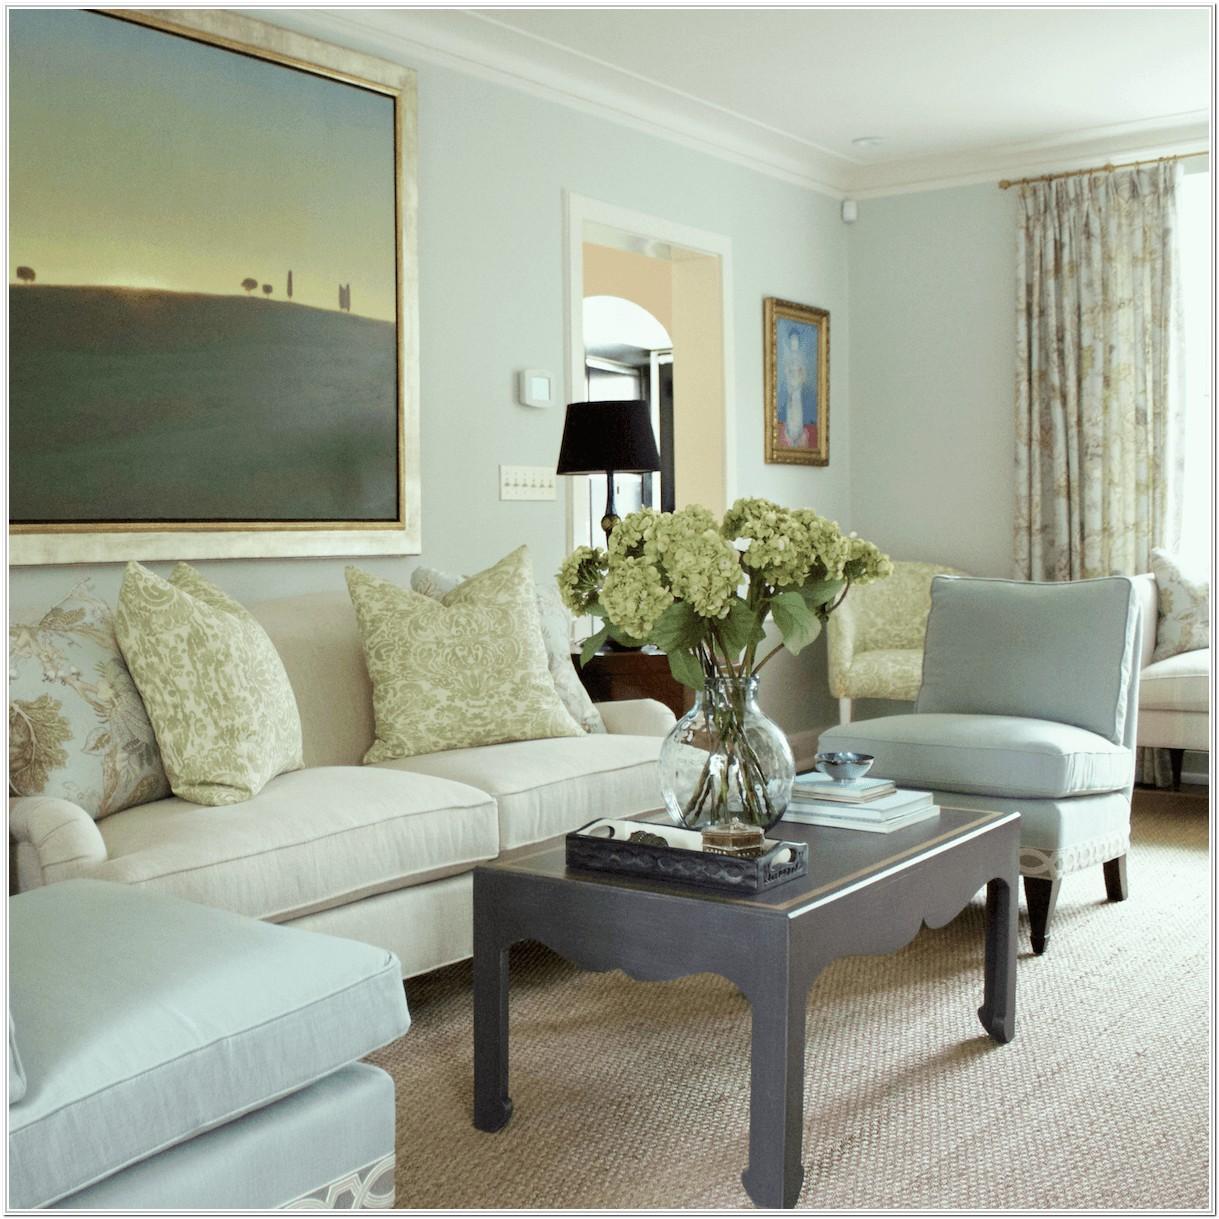 11 X 18 Ft Living Room Ideas